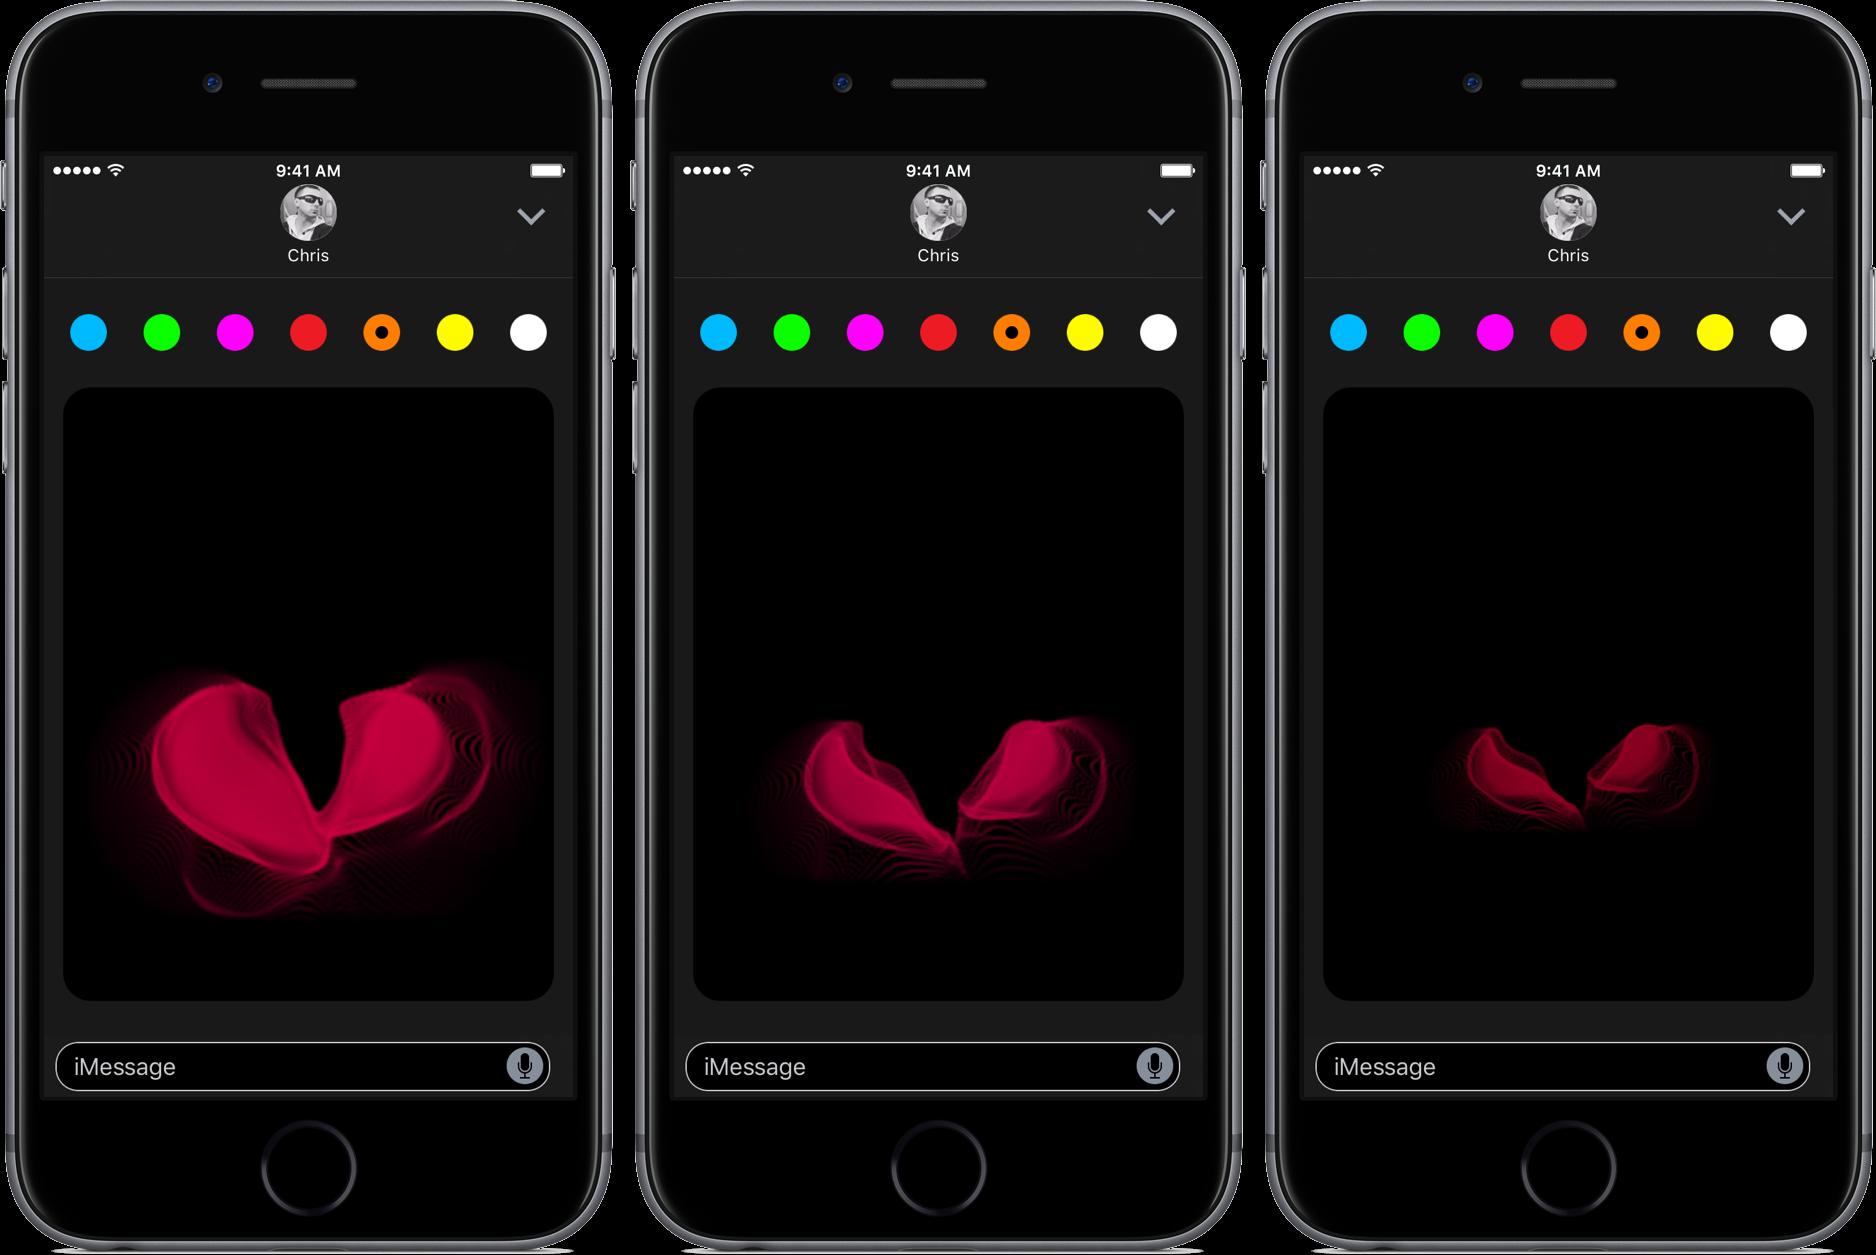 iOS-10-Messages-Digital-Touch-broken-hearts-space-gray-iPhone-screenshot-001